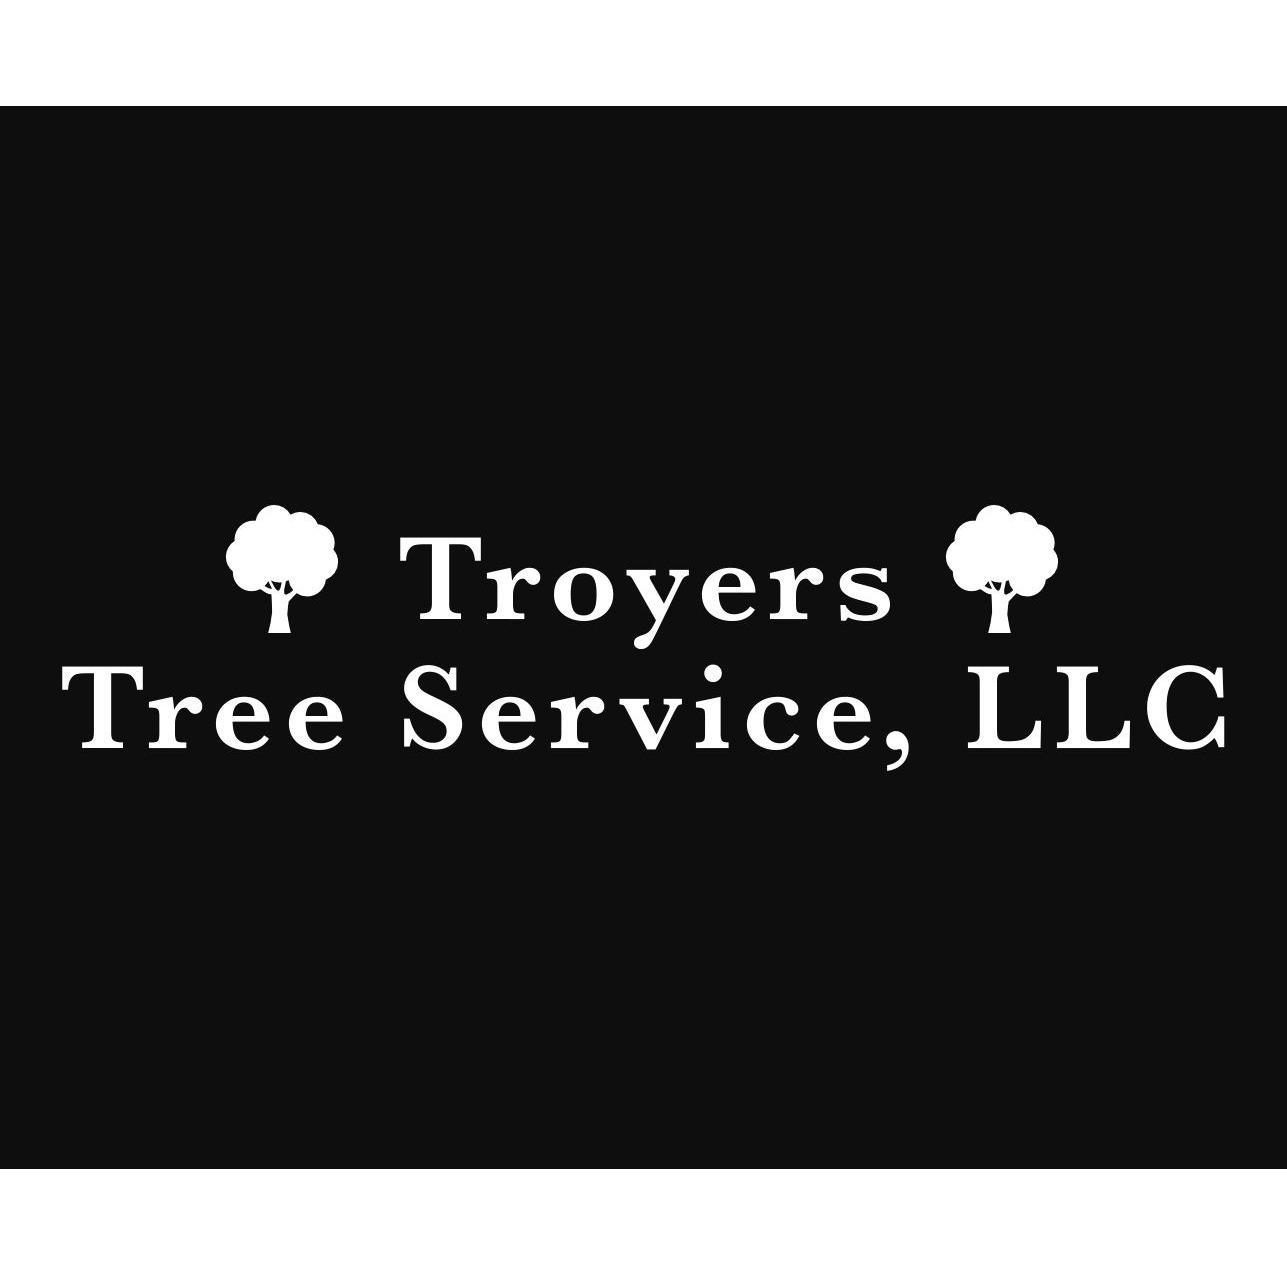 Troyers Tree Service, LLC